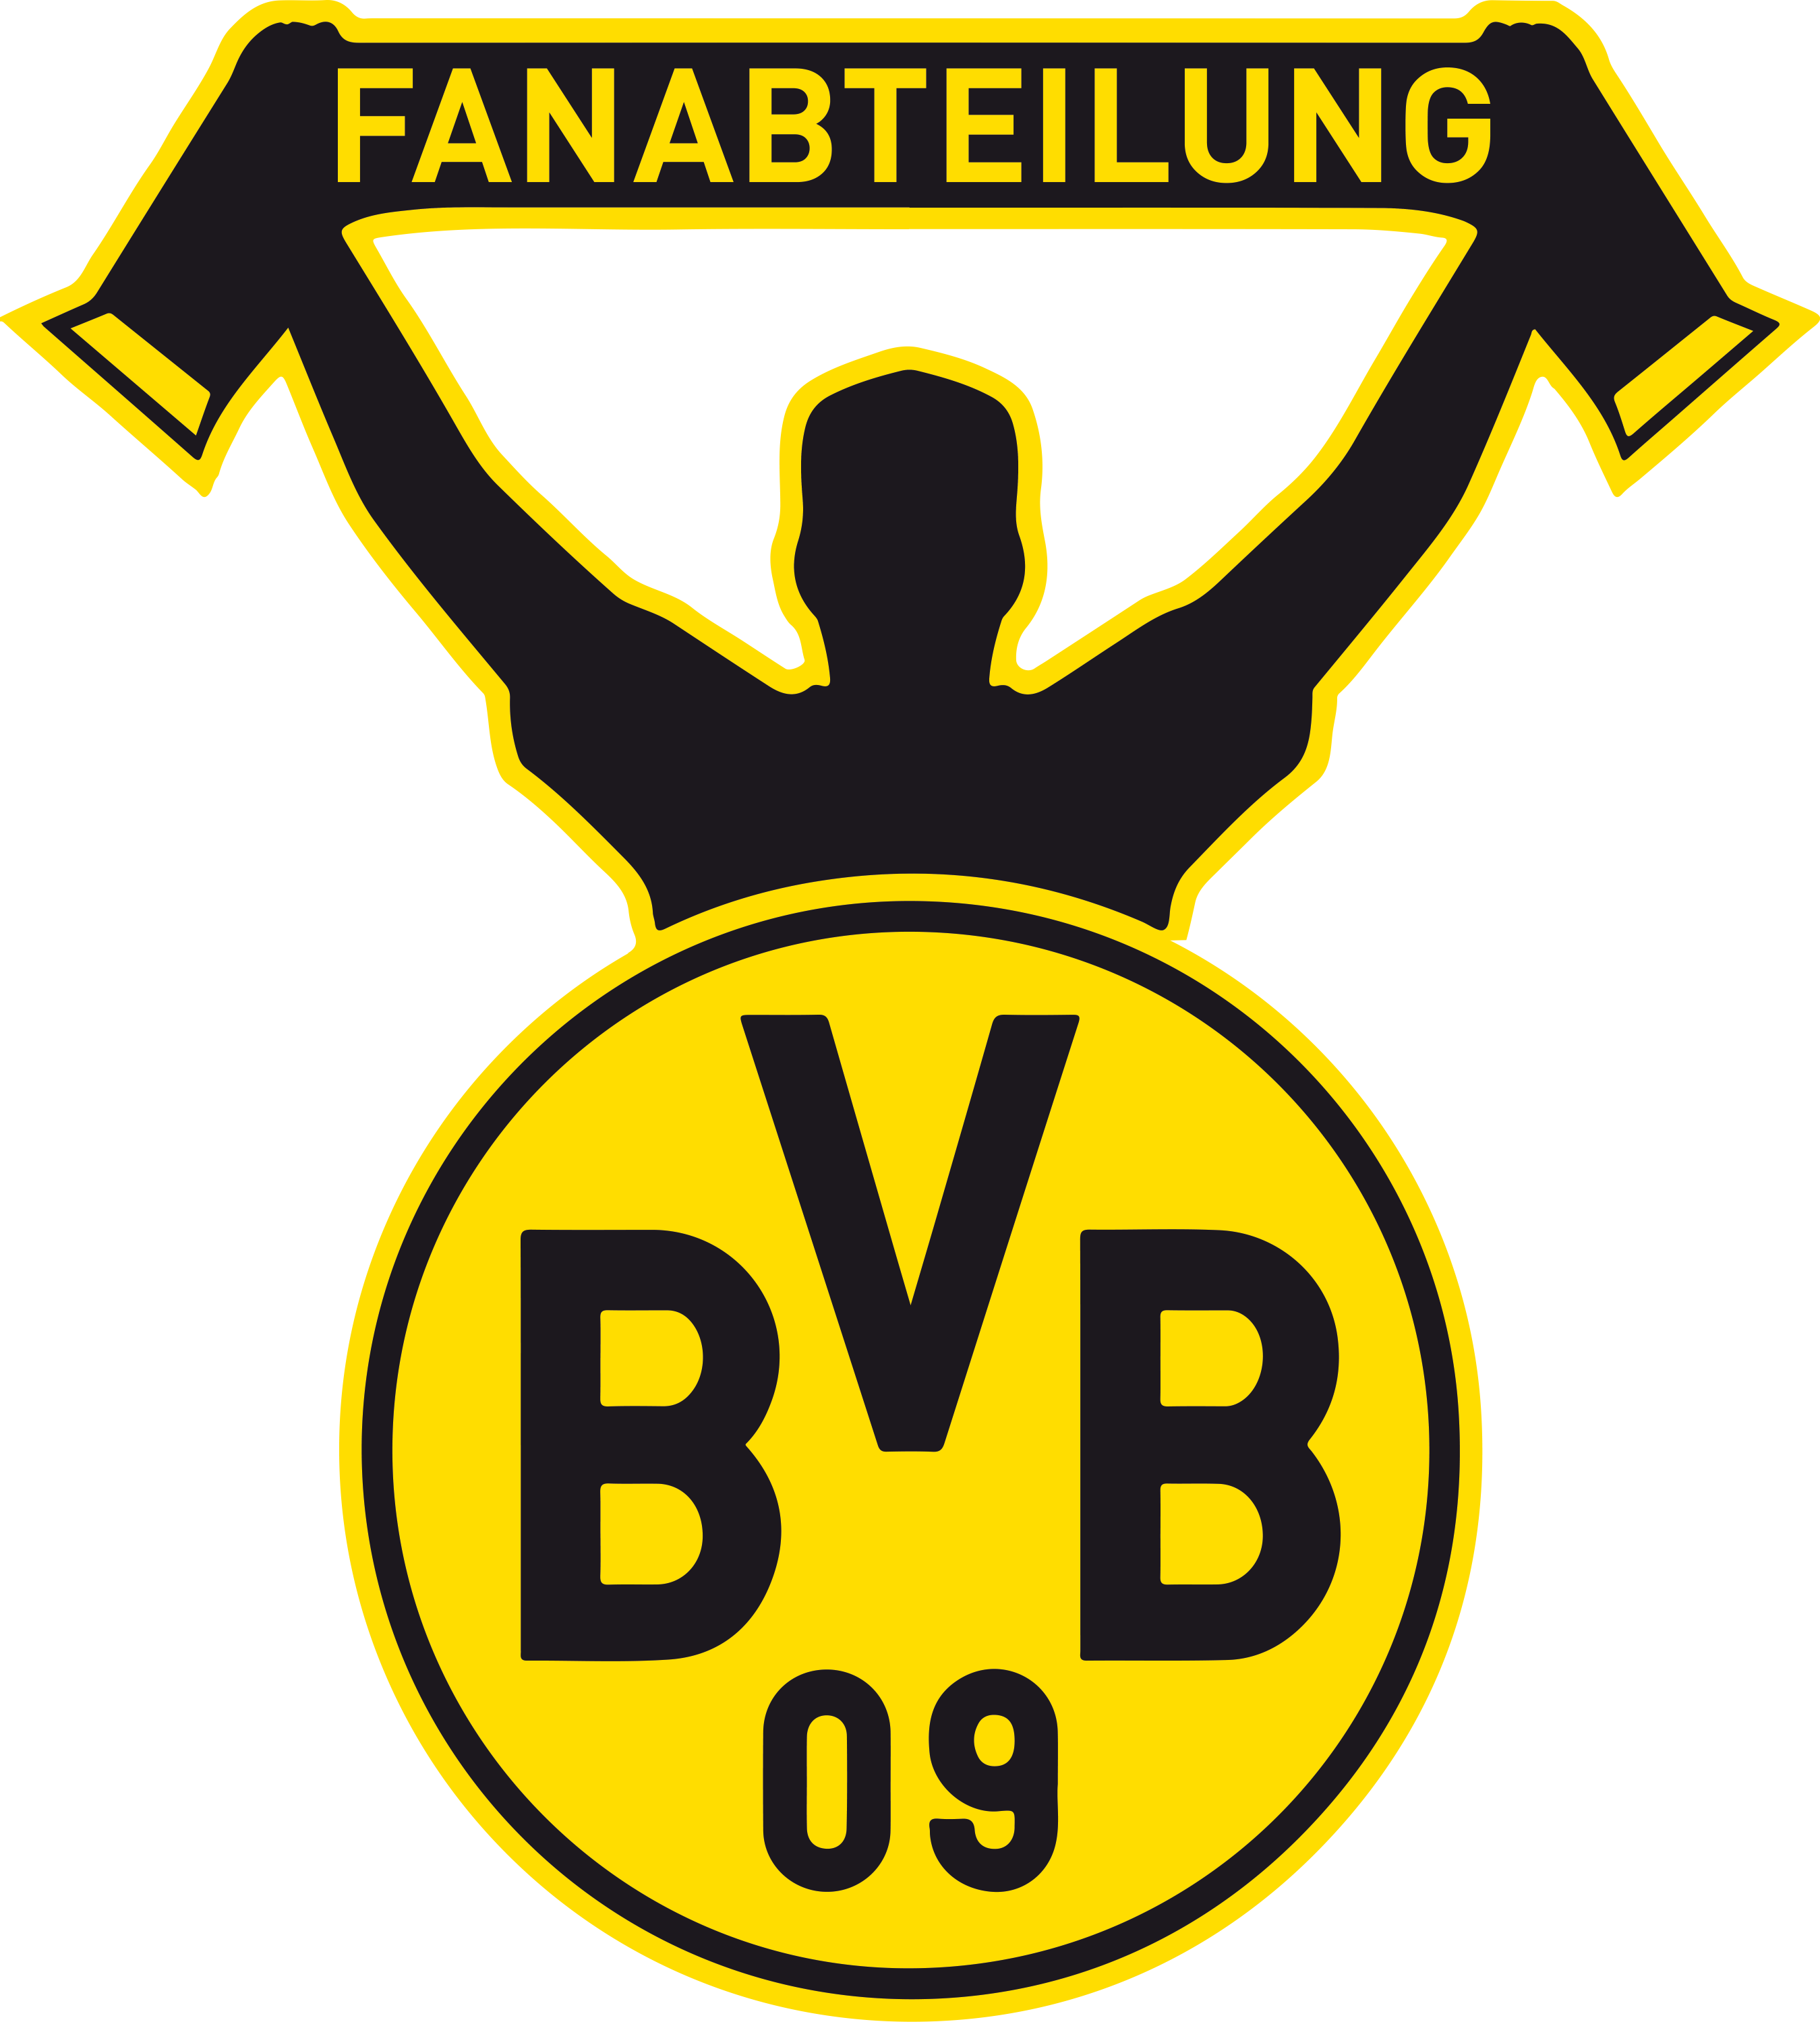 Bildergebnis Fur Bvb Logo Kostenlos Bvb Dortmund Bvb Borussia Dortmund Wallpaper